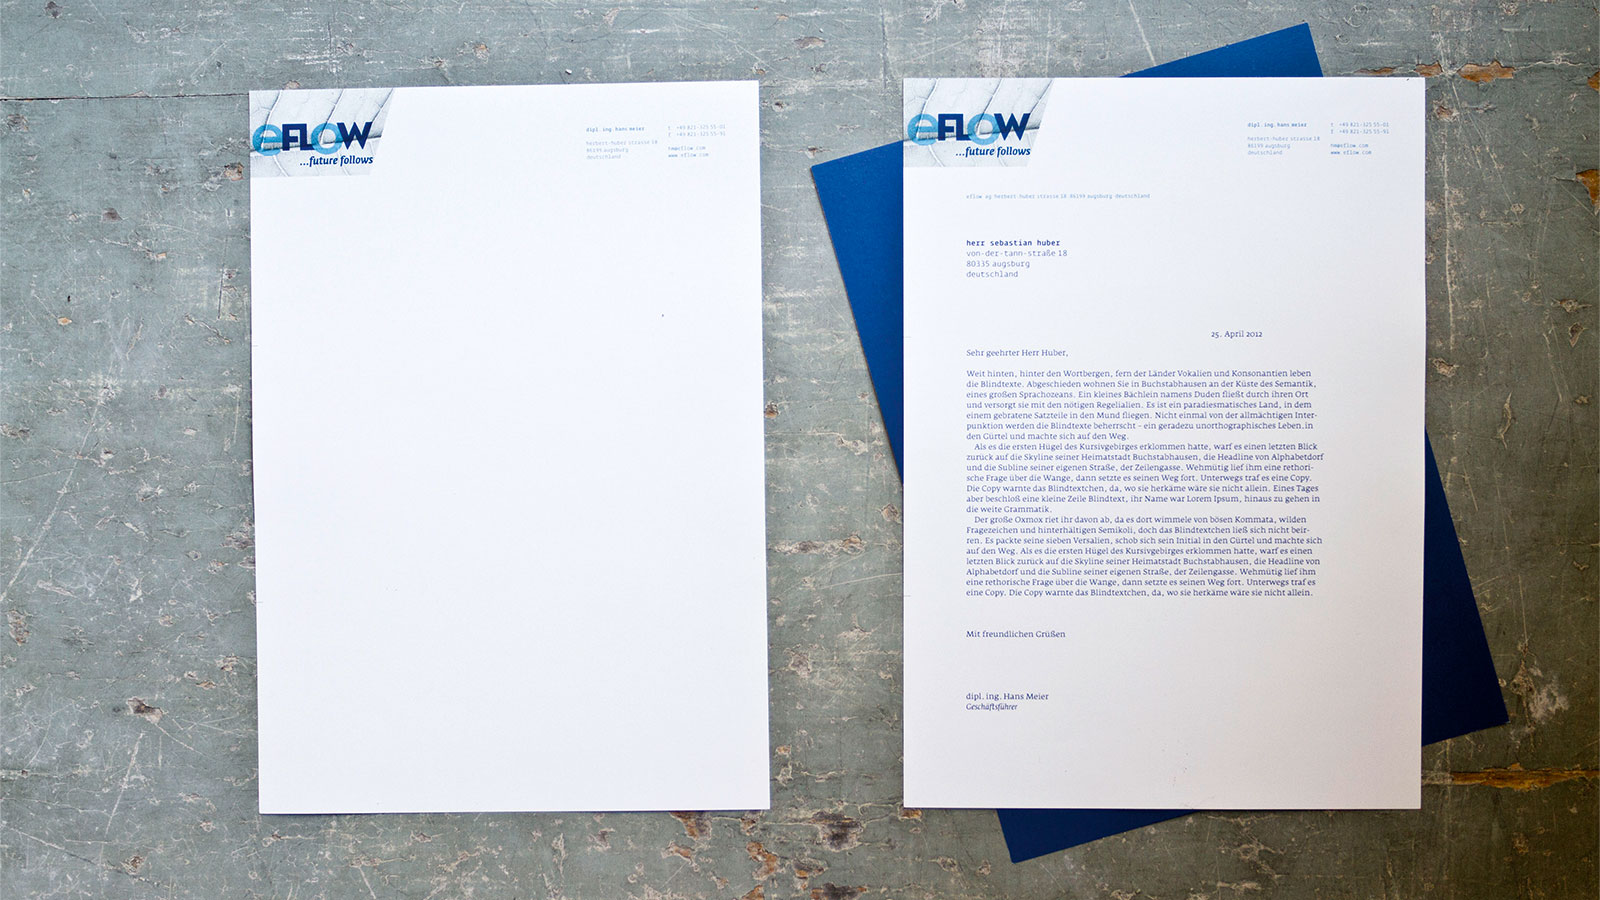 eflow-1600x900-1